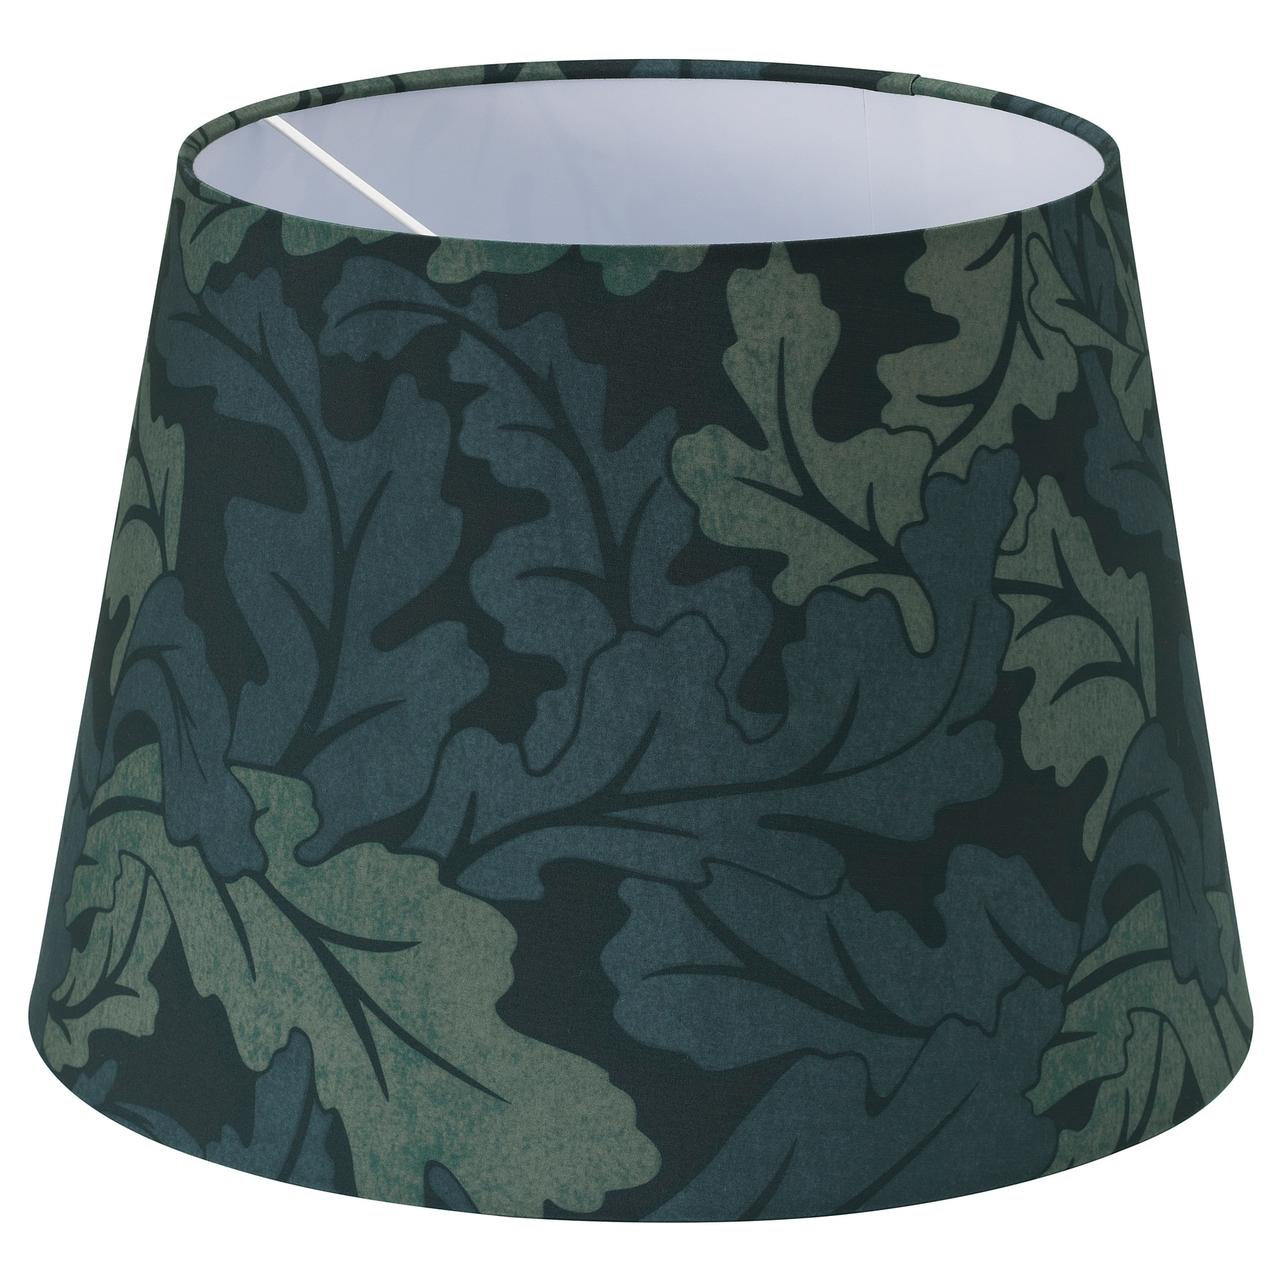 РЮРА Абажур, темно-зеленый лист